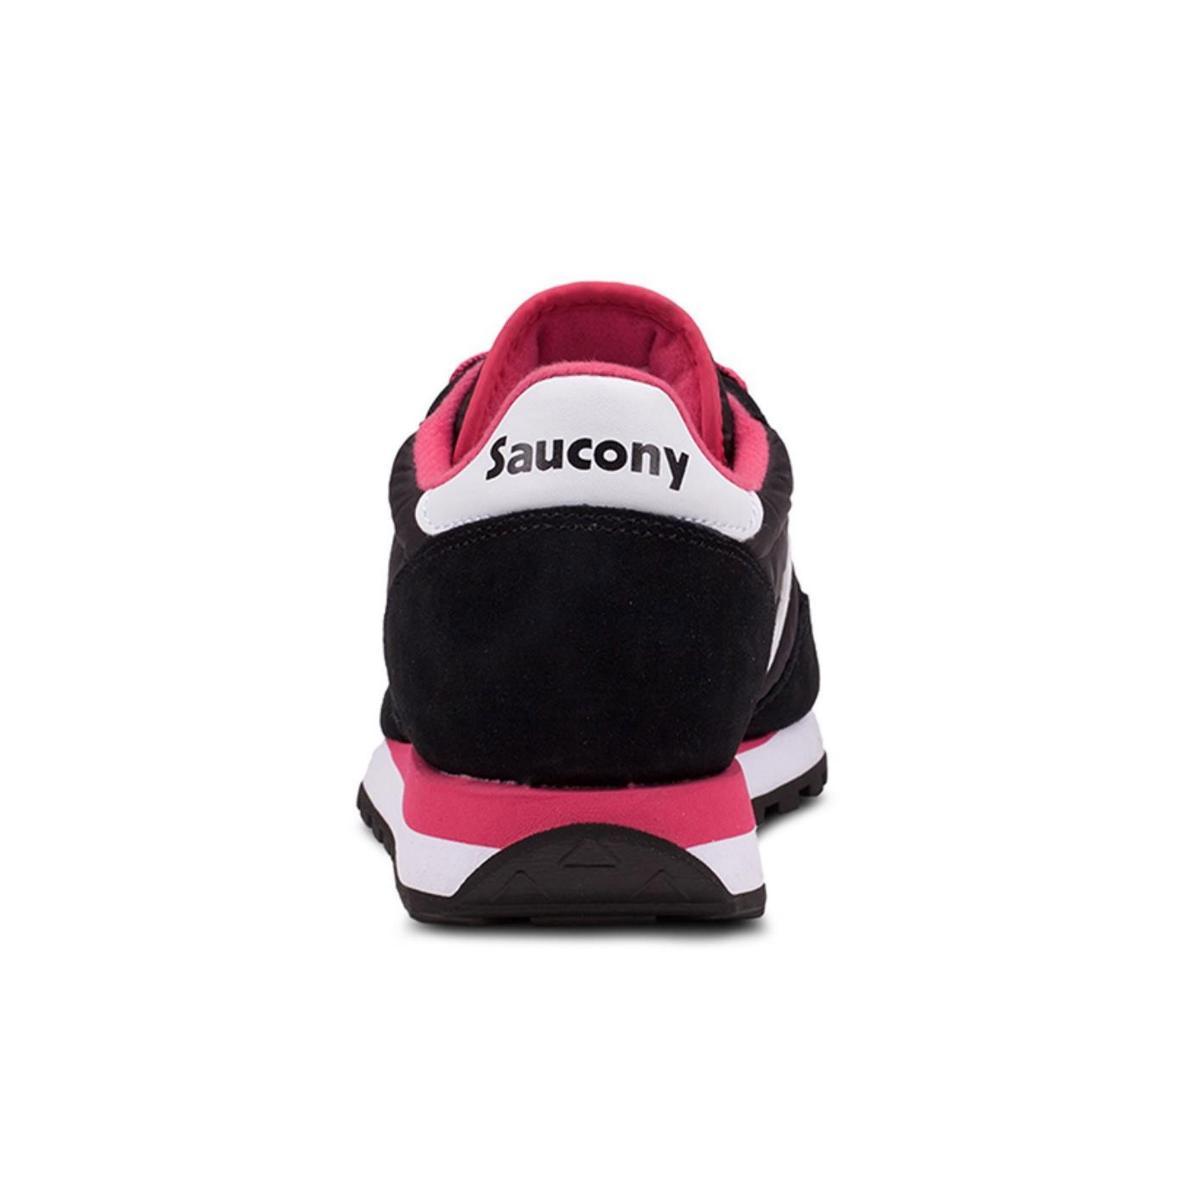 Scarpe Sneakers Saucony Jazz Original Donna rif. S1044-443